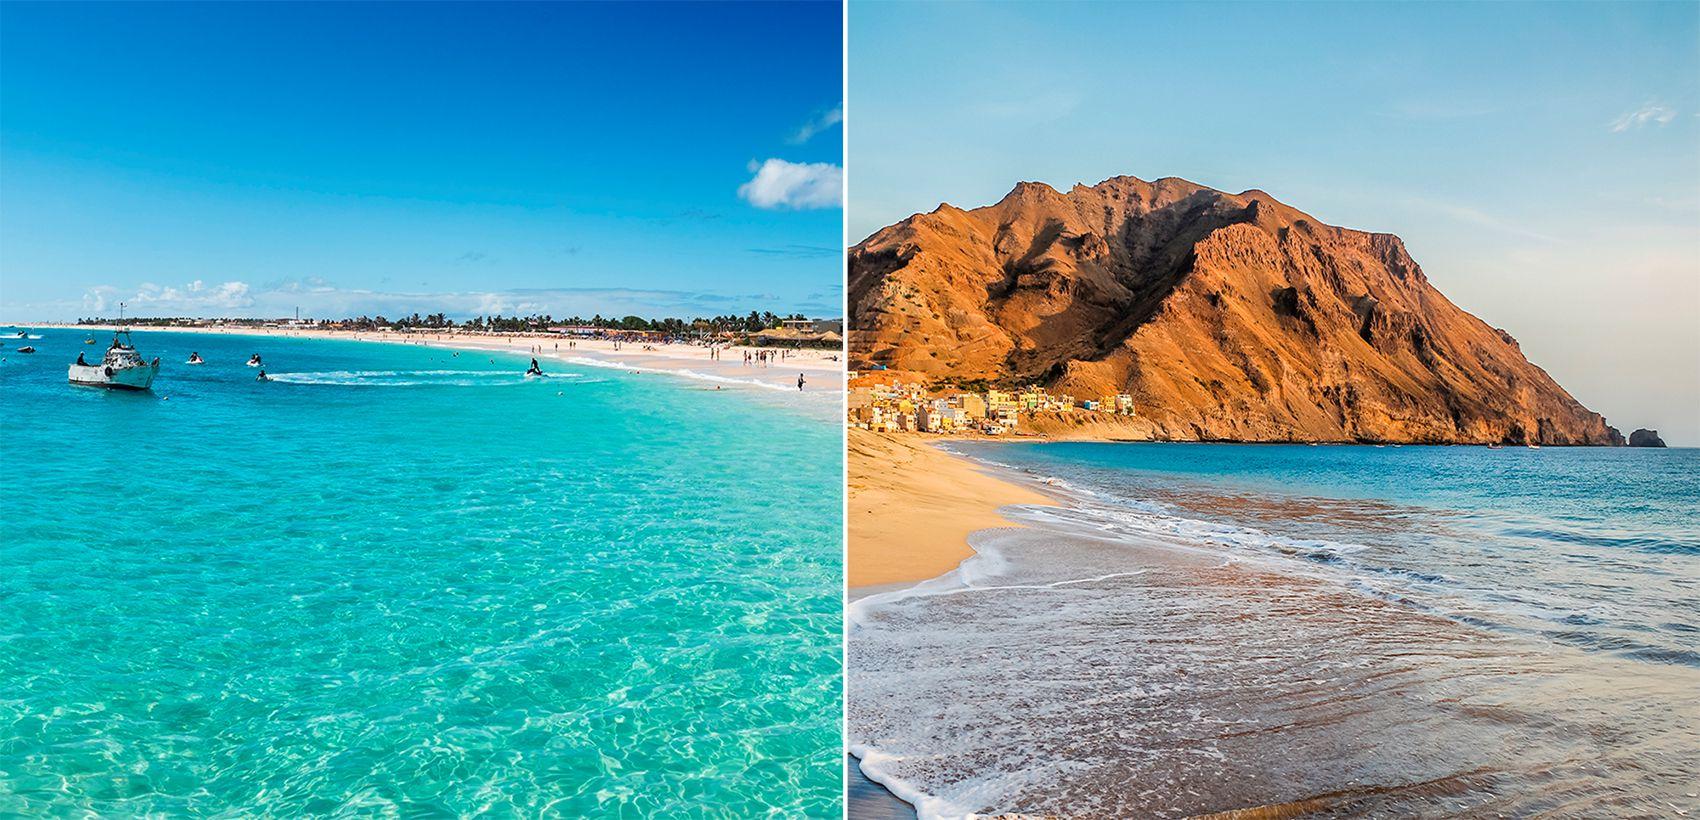 Cabo Verde à la Carte: Sal + S.Vicente - 01.06 a 31.10